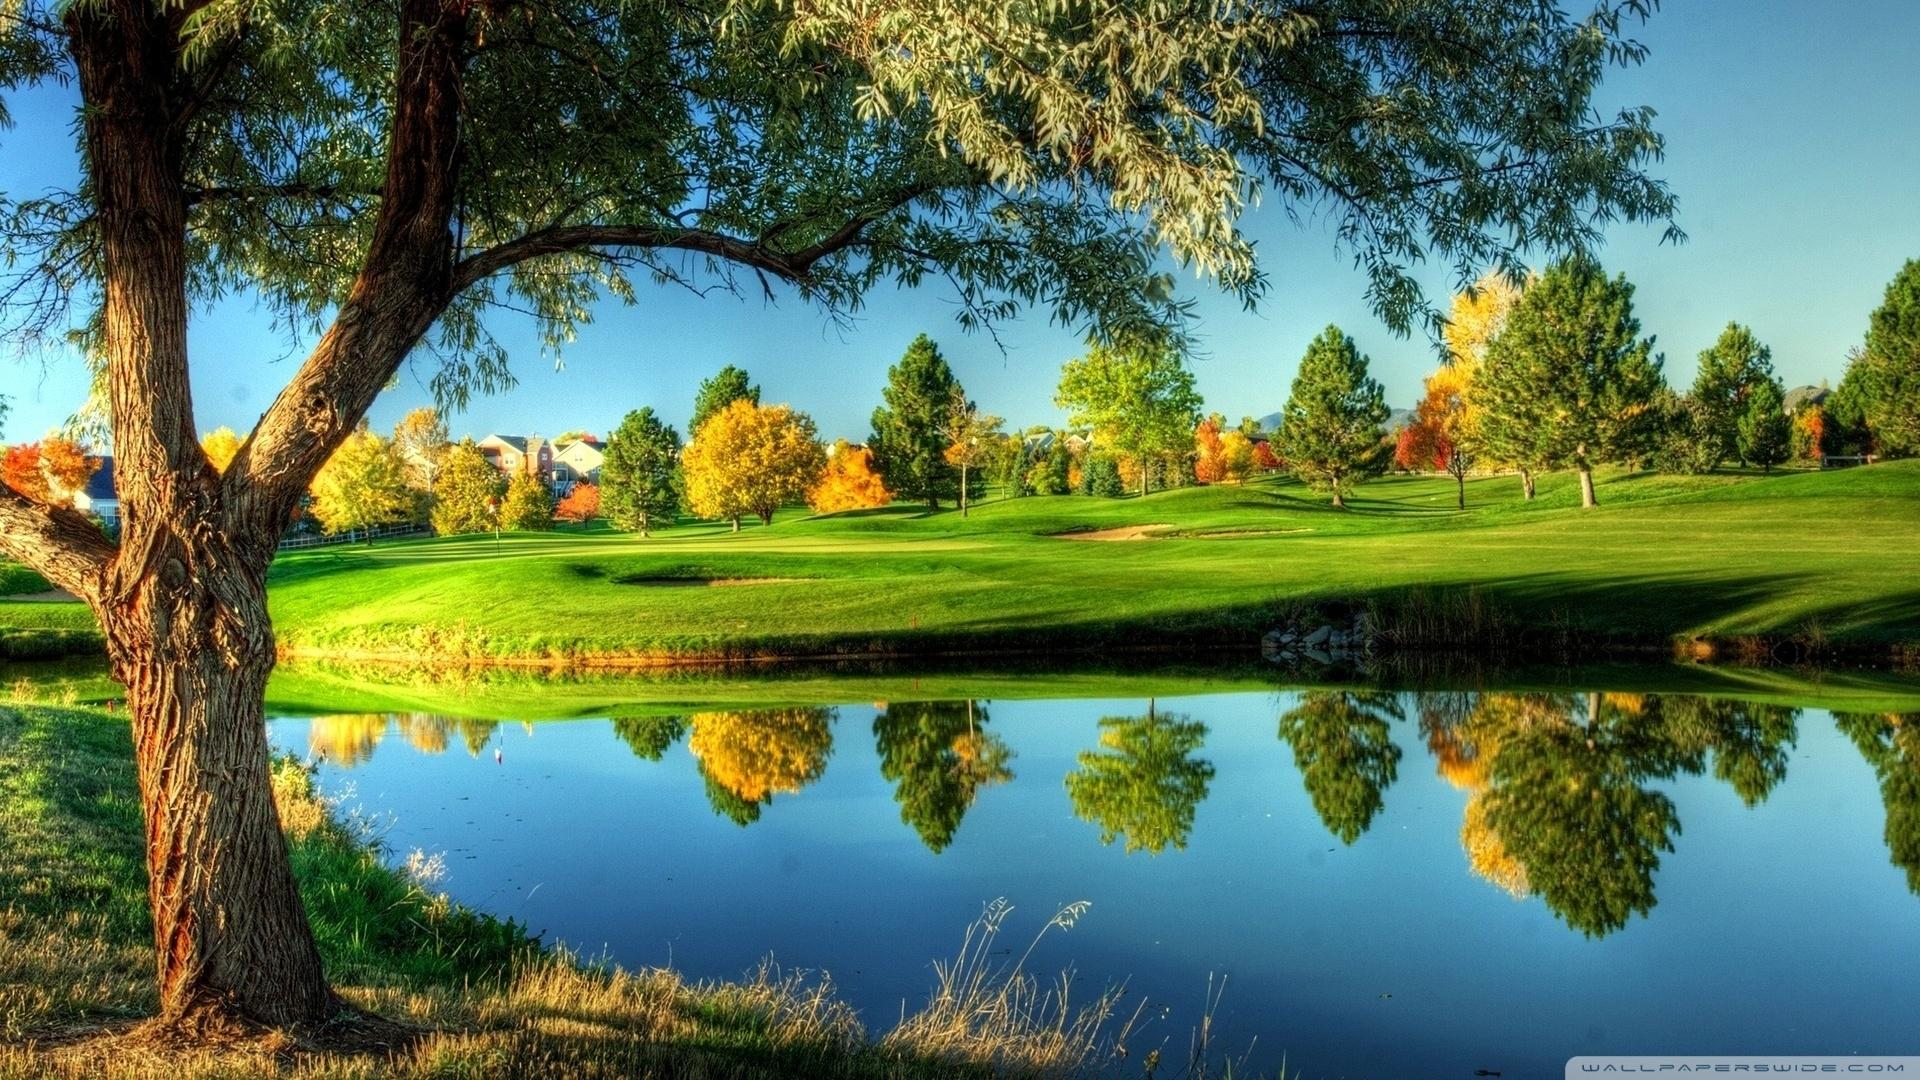 golf course landscape ❤ 4k hd desktop wallpaper for 4k ultra hd tv